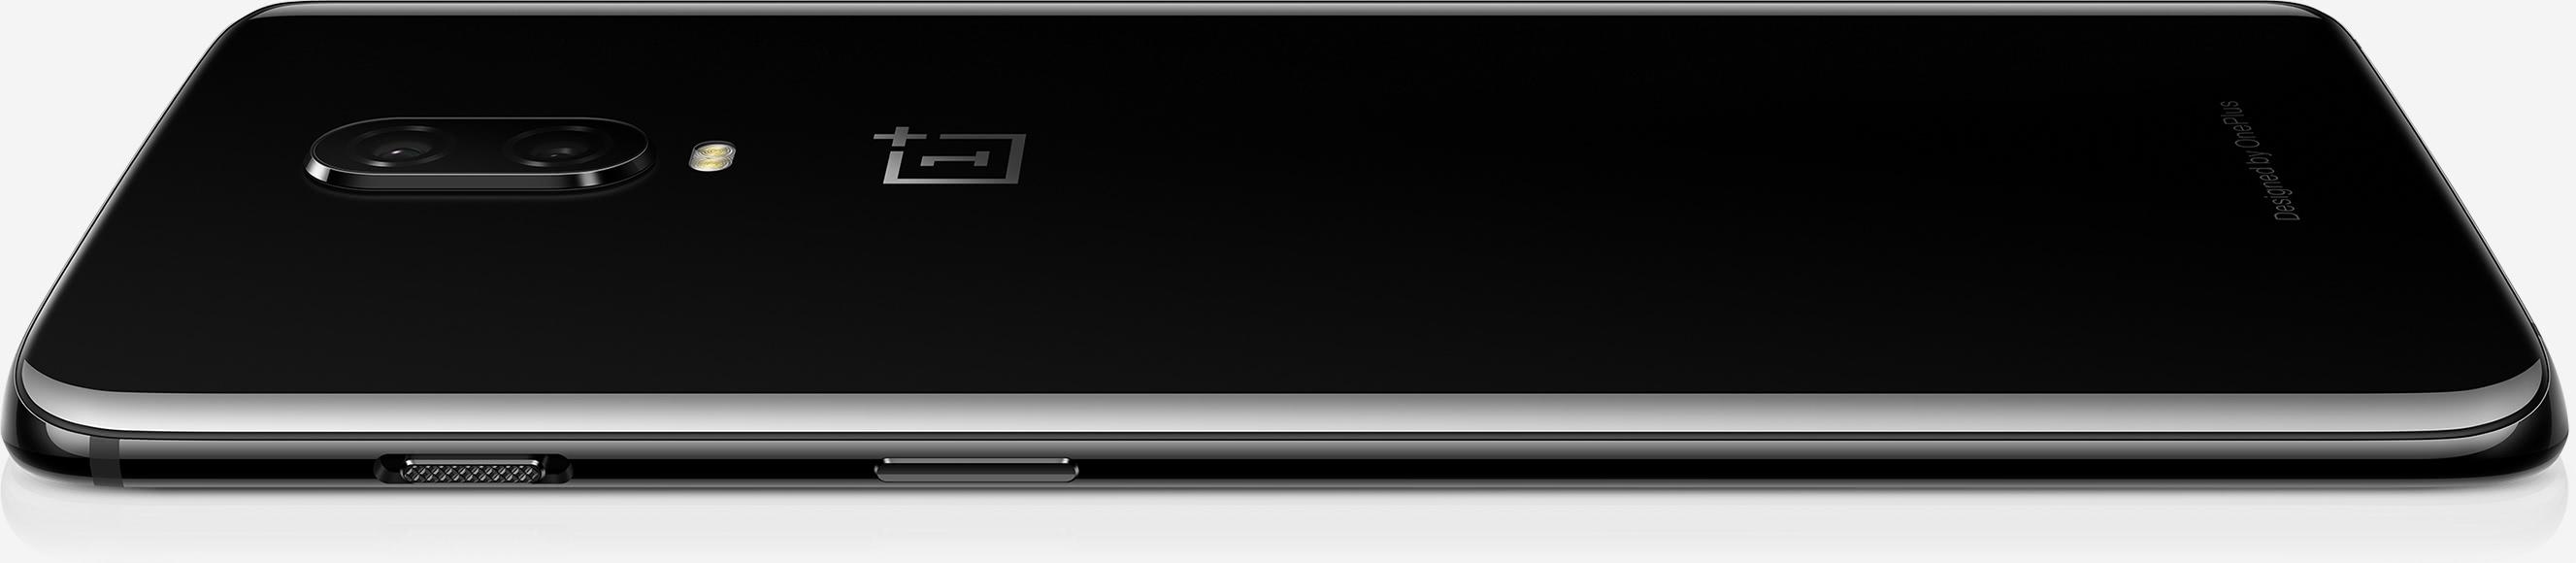 OnePlus T6 cubierta